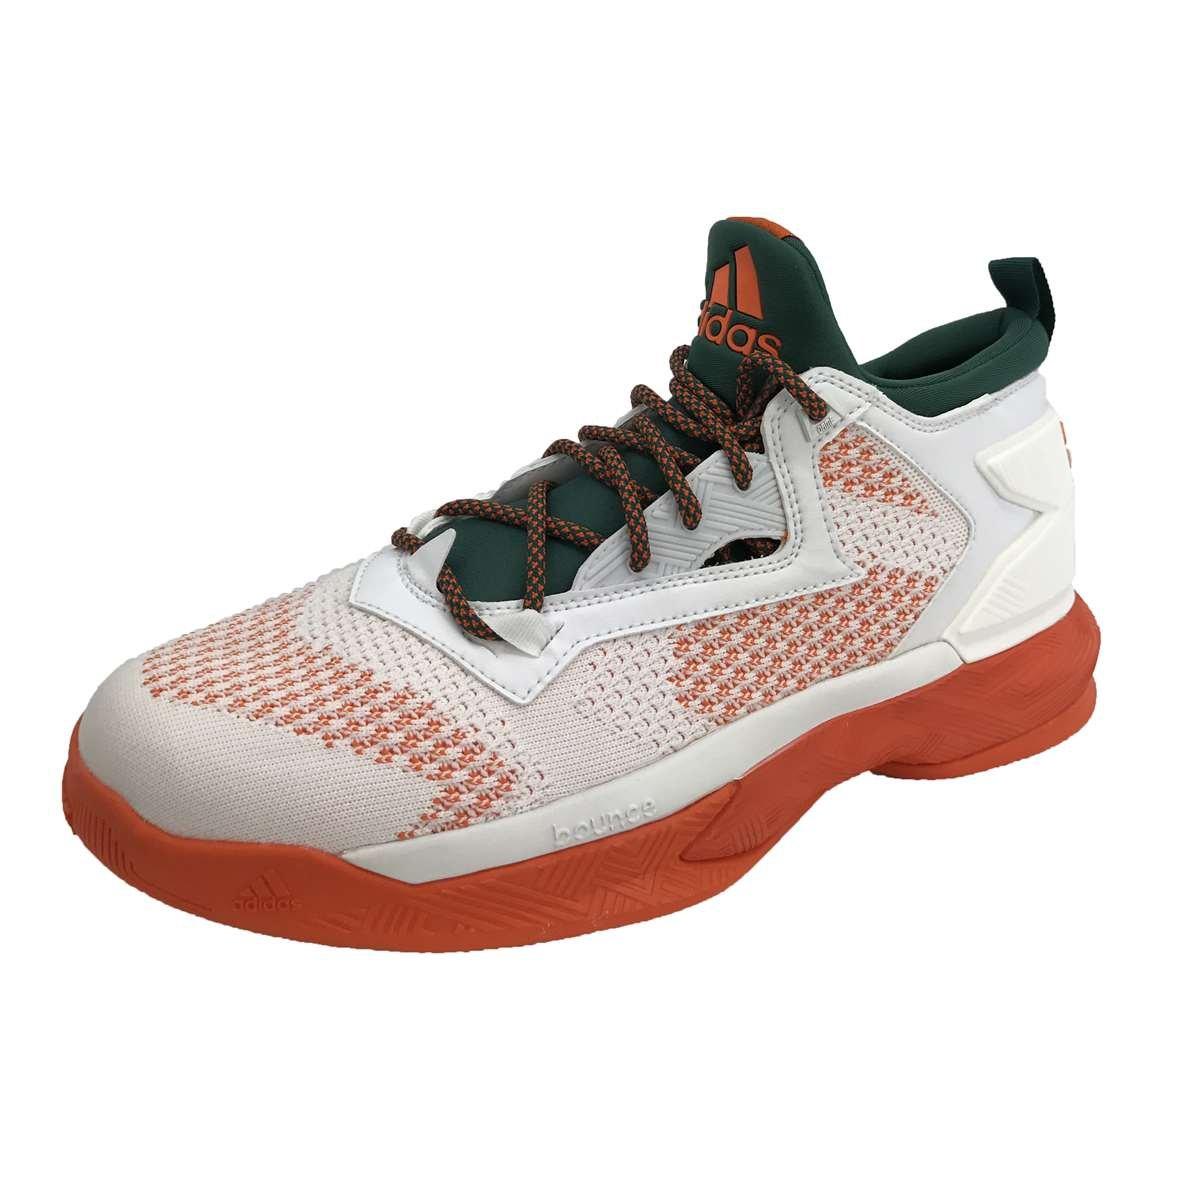 adidas Men's D Lillard 2 Basketball Shoes B073ZL6R1F 13 D(M) US Footwear White/Core Green/Orange